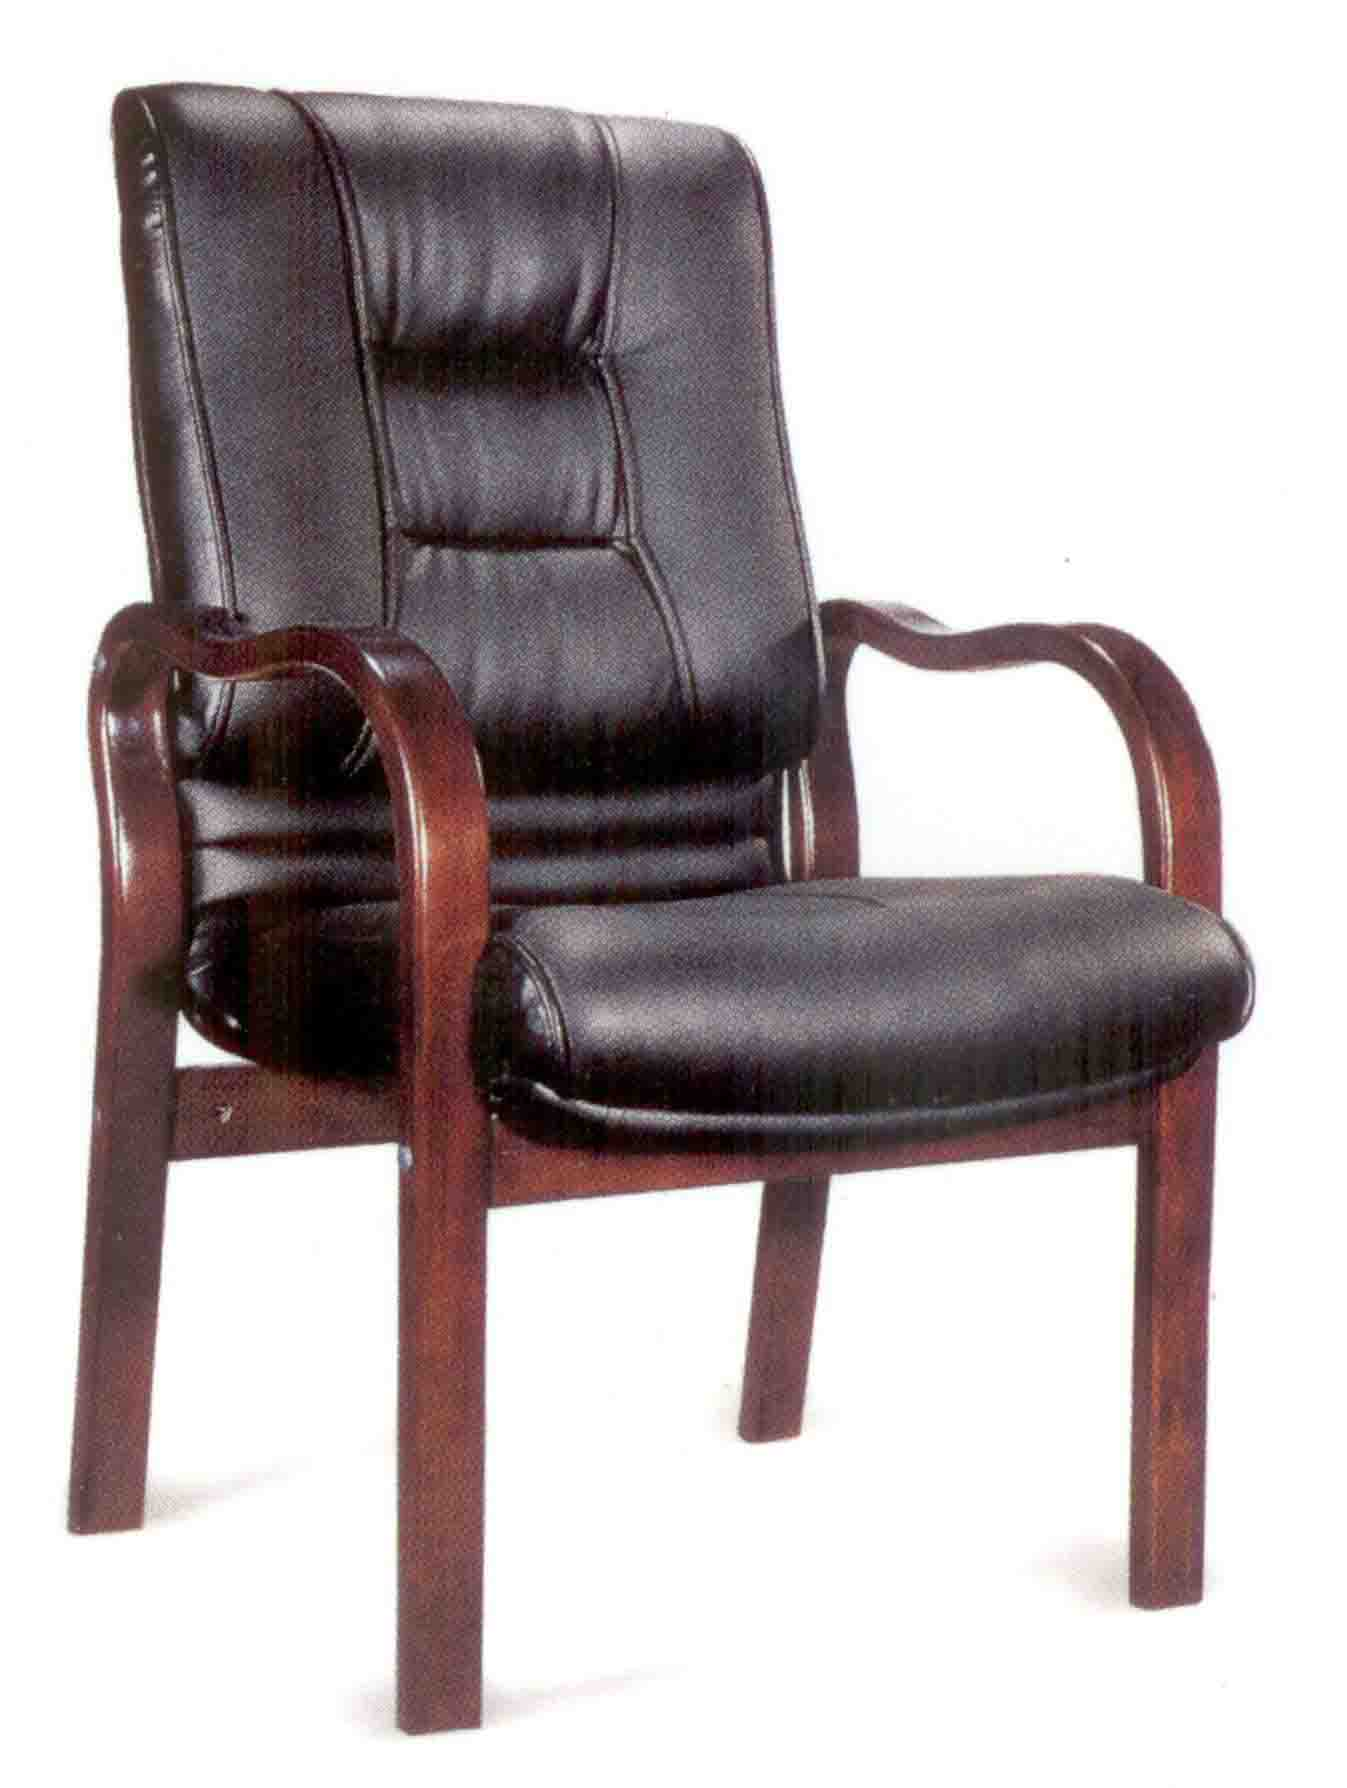 desk chair legs outdoor ottoman set wooden hostgarcia